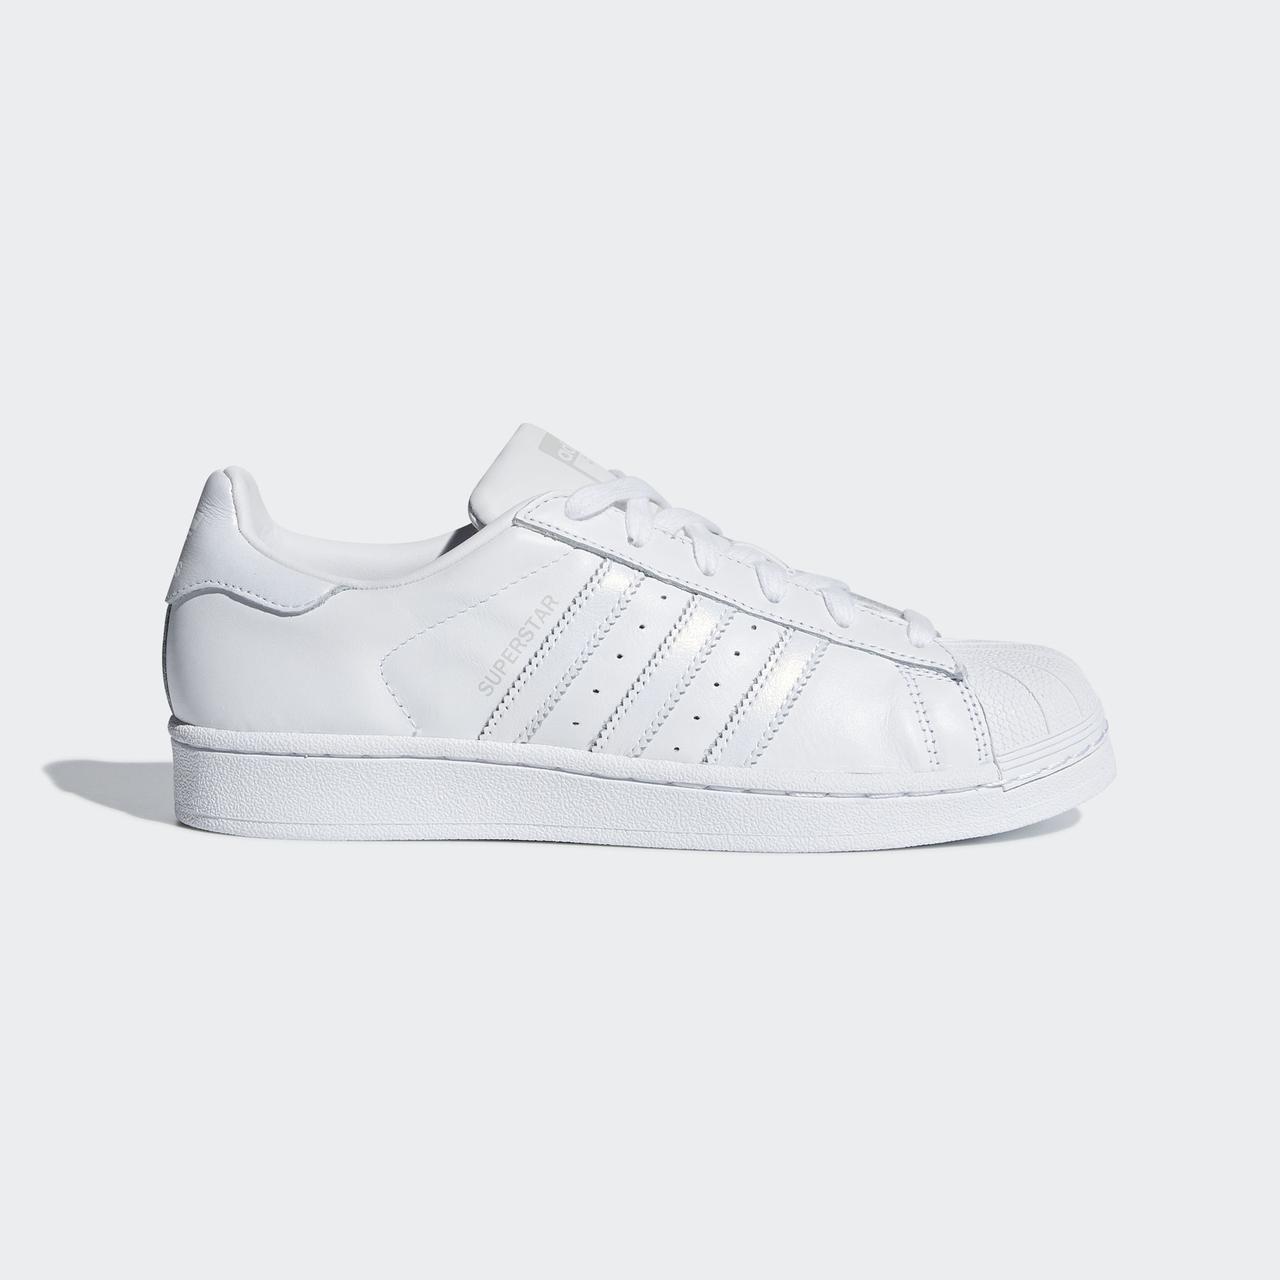 Женские кроссовки Adidas Originals Superstar (Артикул: AQ1214)